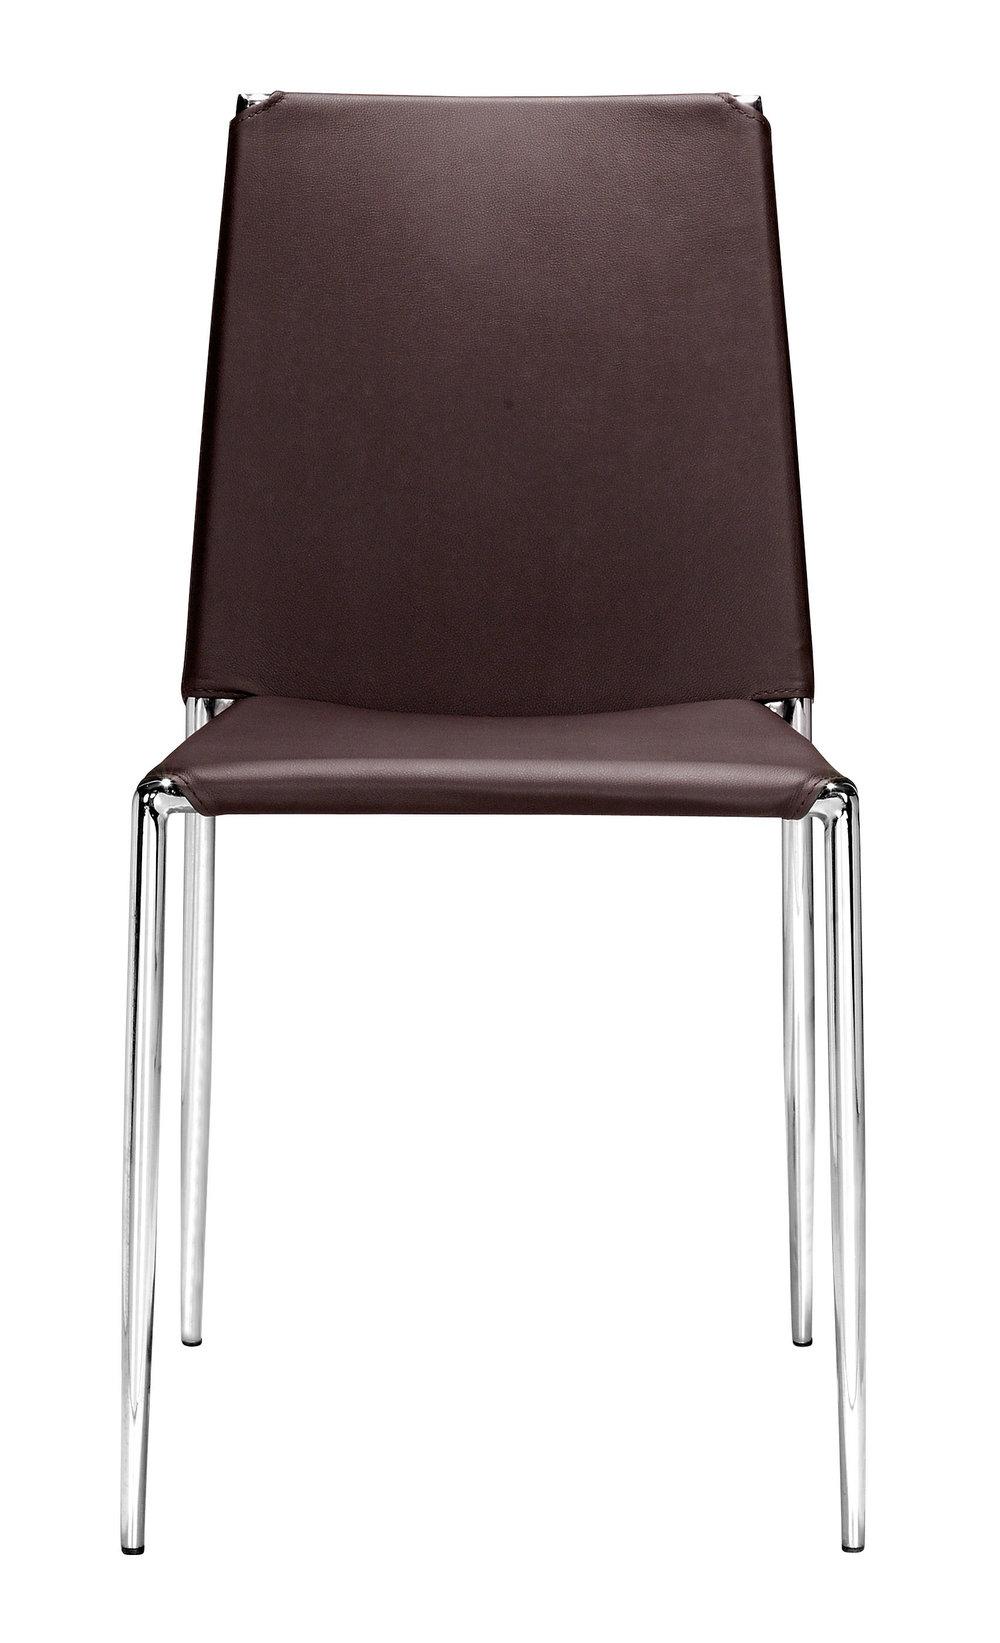 Zuo Modern Contemporary - Alex Dining Chair - Set of 4 - Espresso